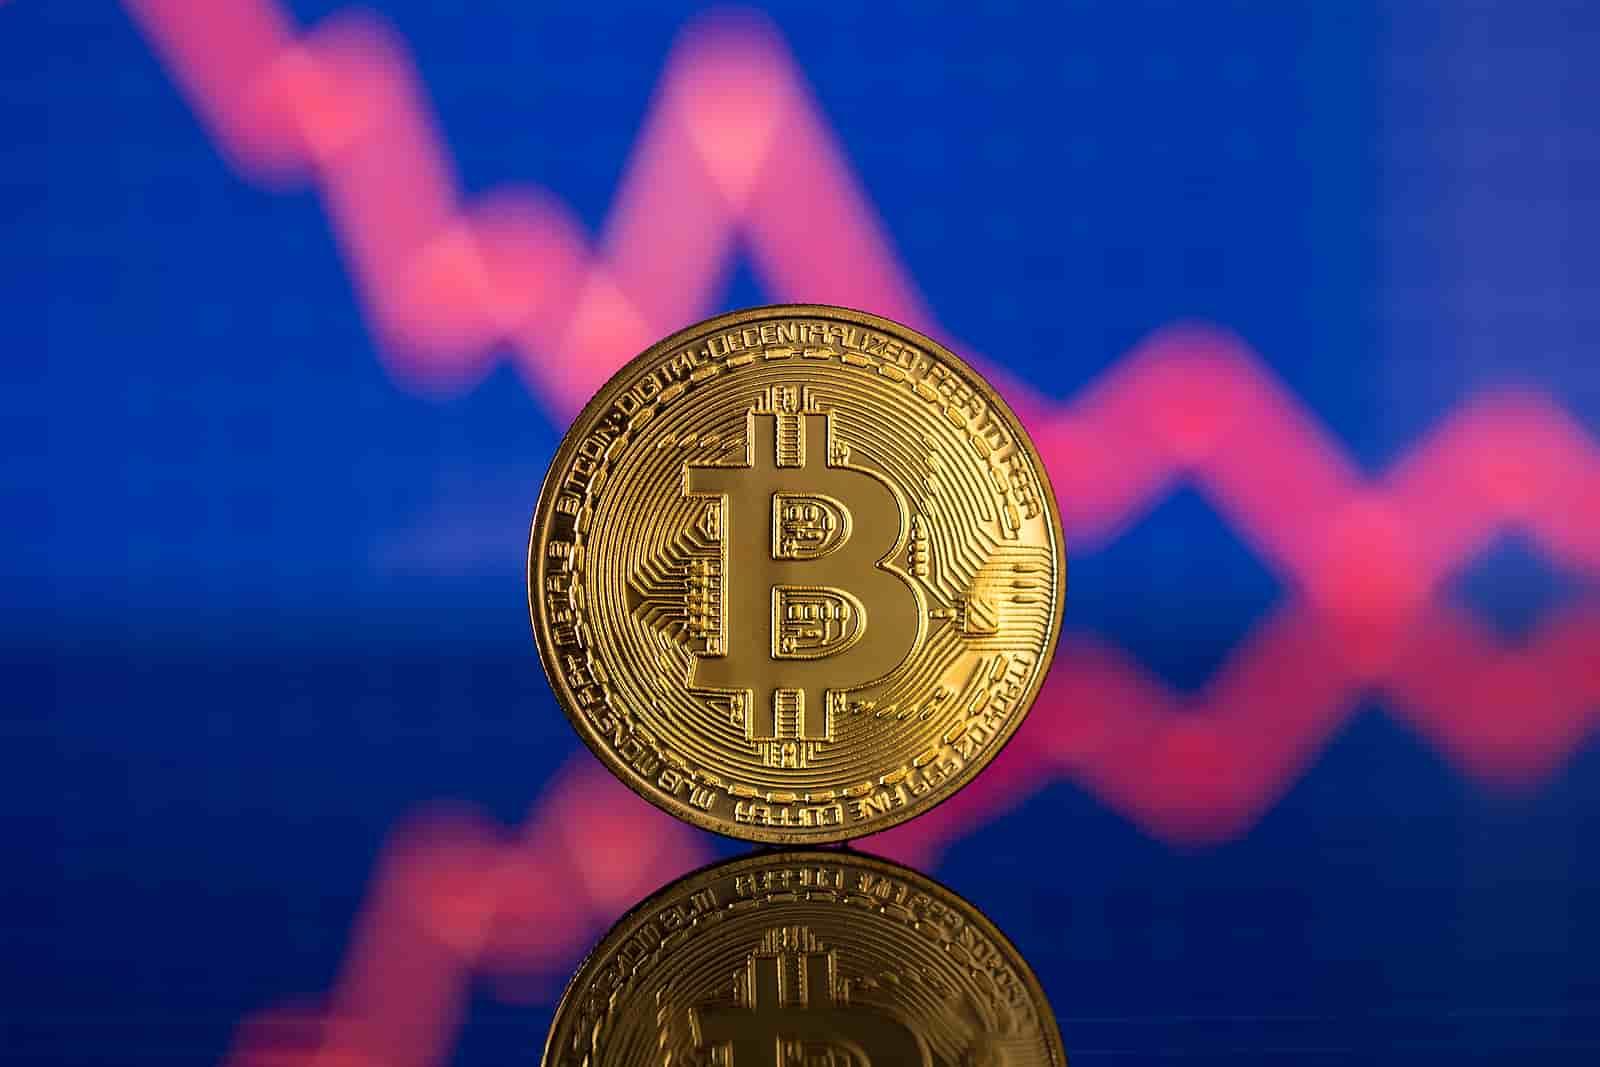 bitcoin investimento confiança gbtc opciones binarias en piloto automático